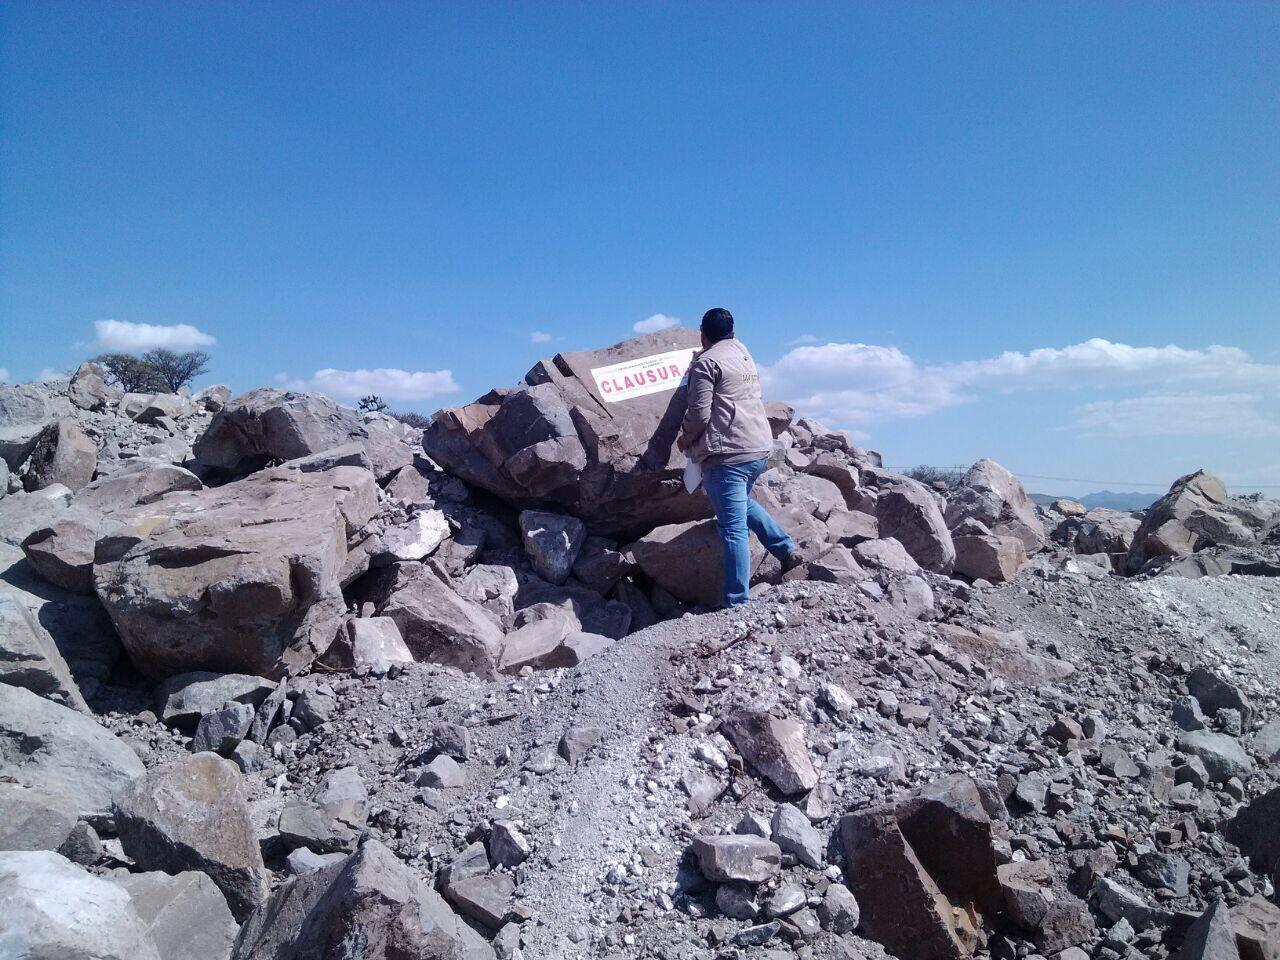 Clausura profepa ilegal construcci n de bodega en terrenos for Construccion de viveros forestales